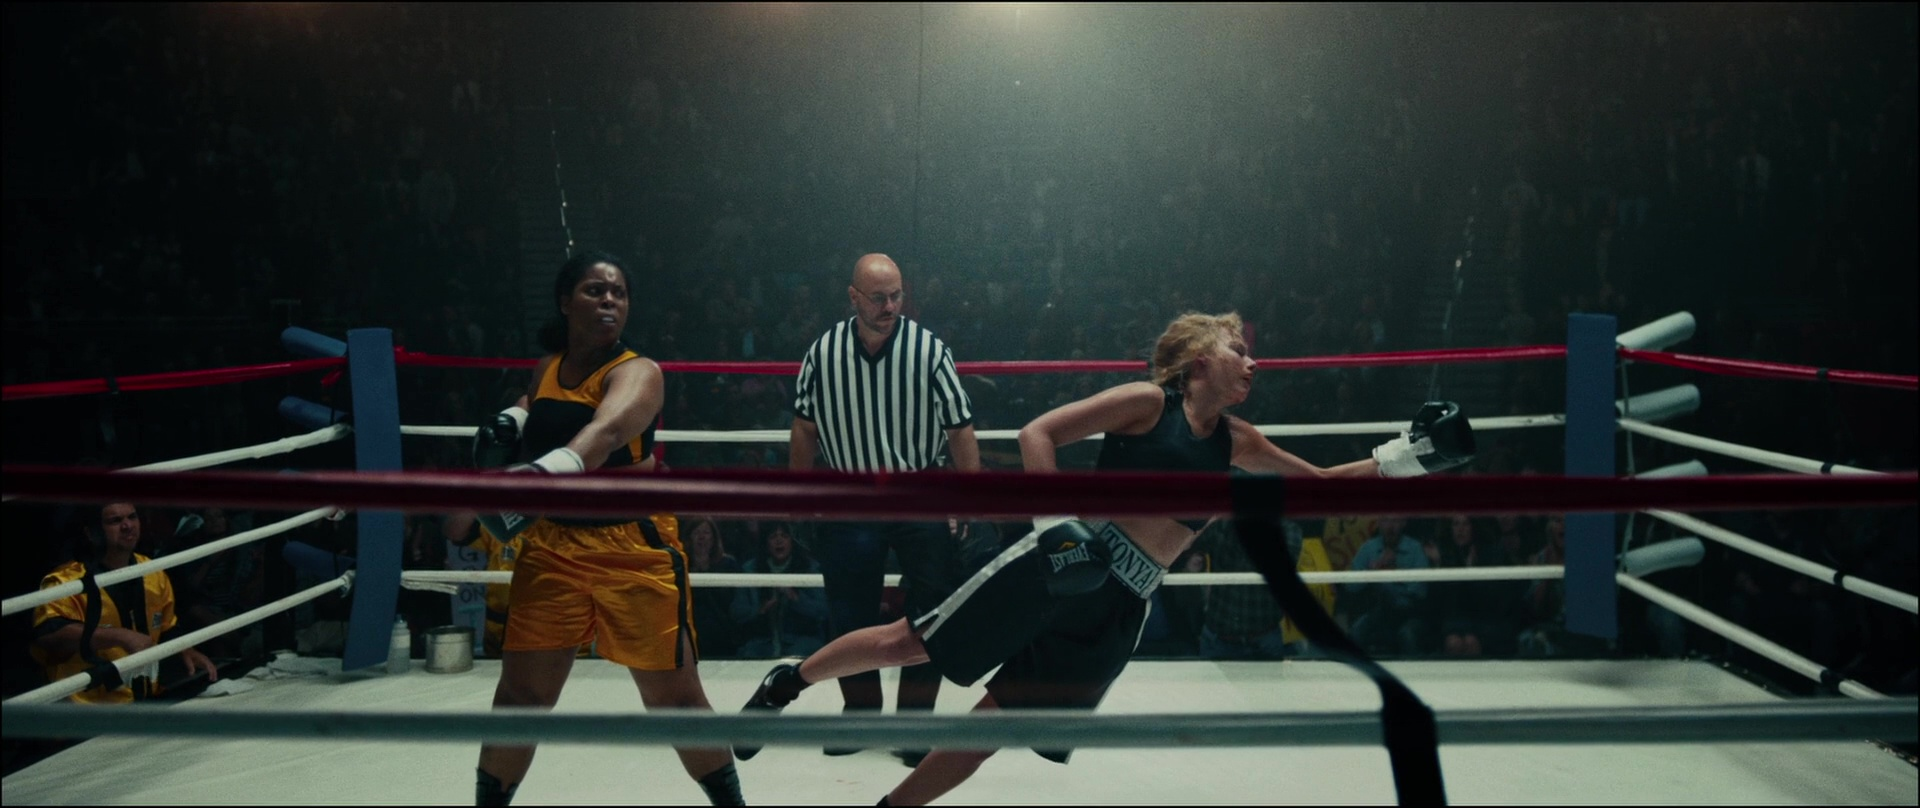 Everlast Boxing Gloves Worn by Margot Robbie in I, Tonya (2017) Movie